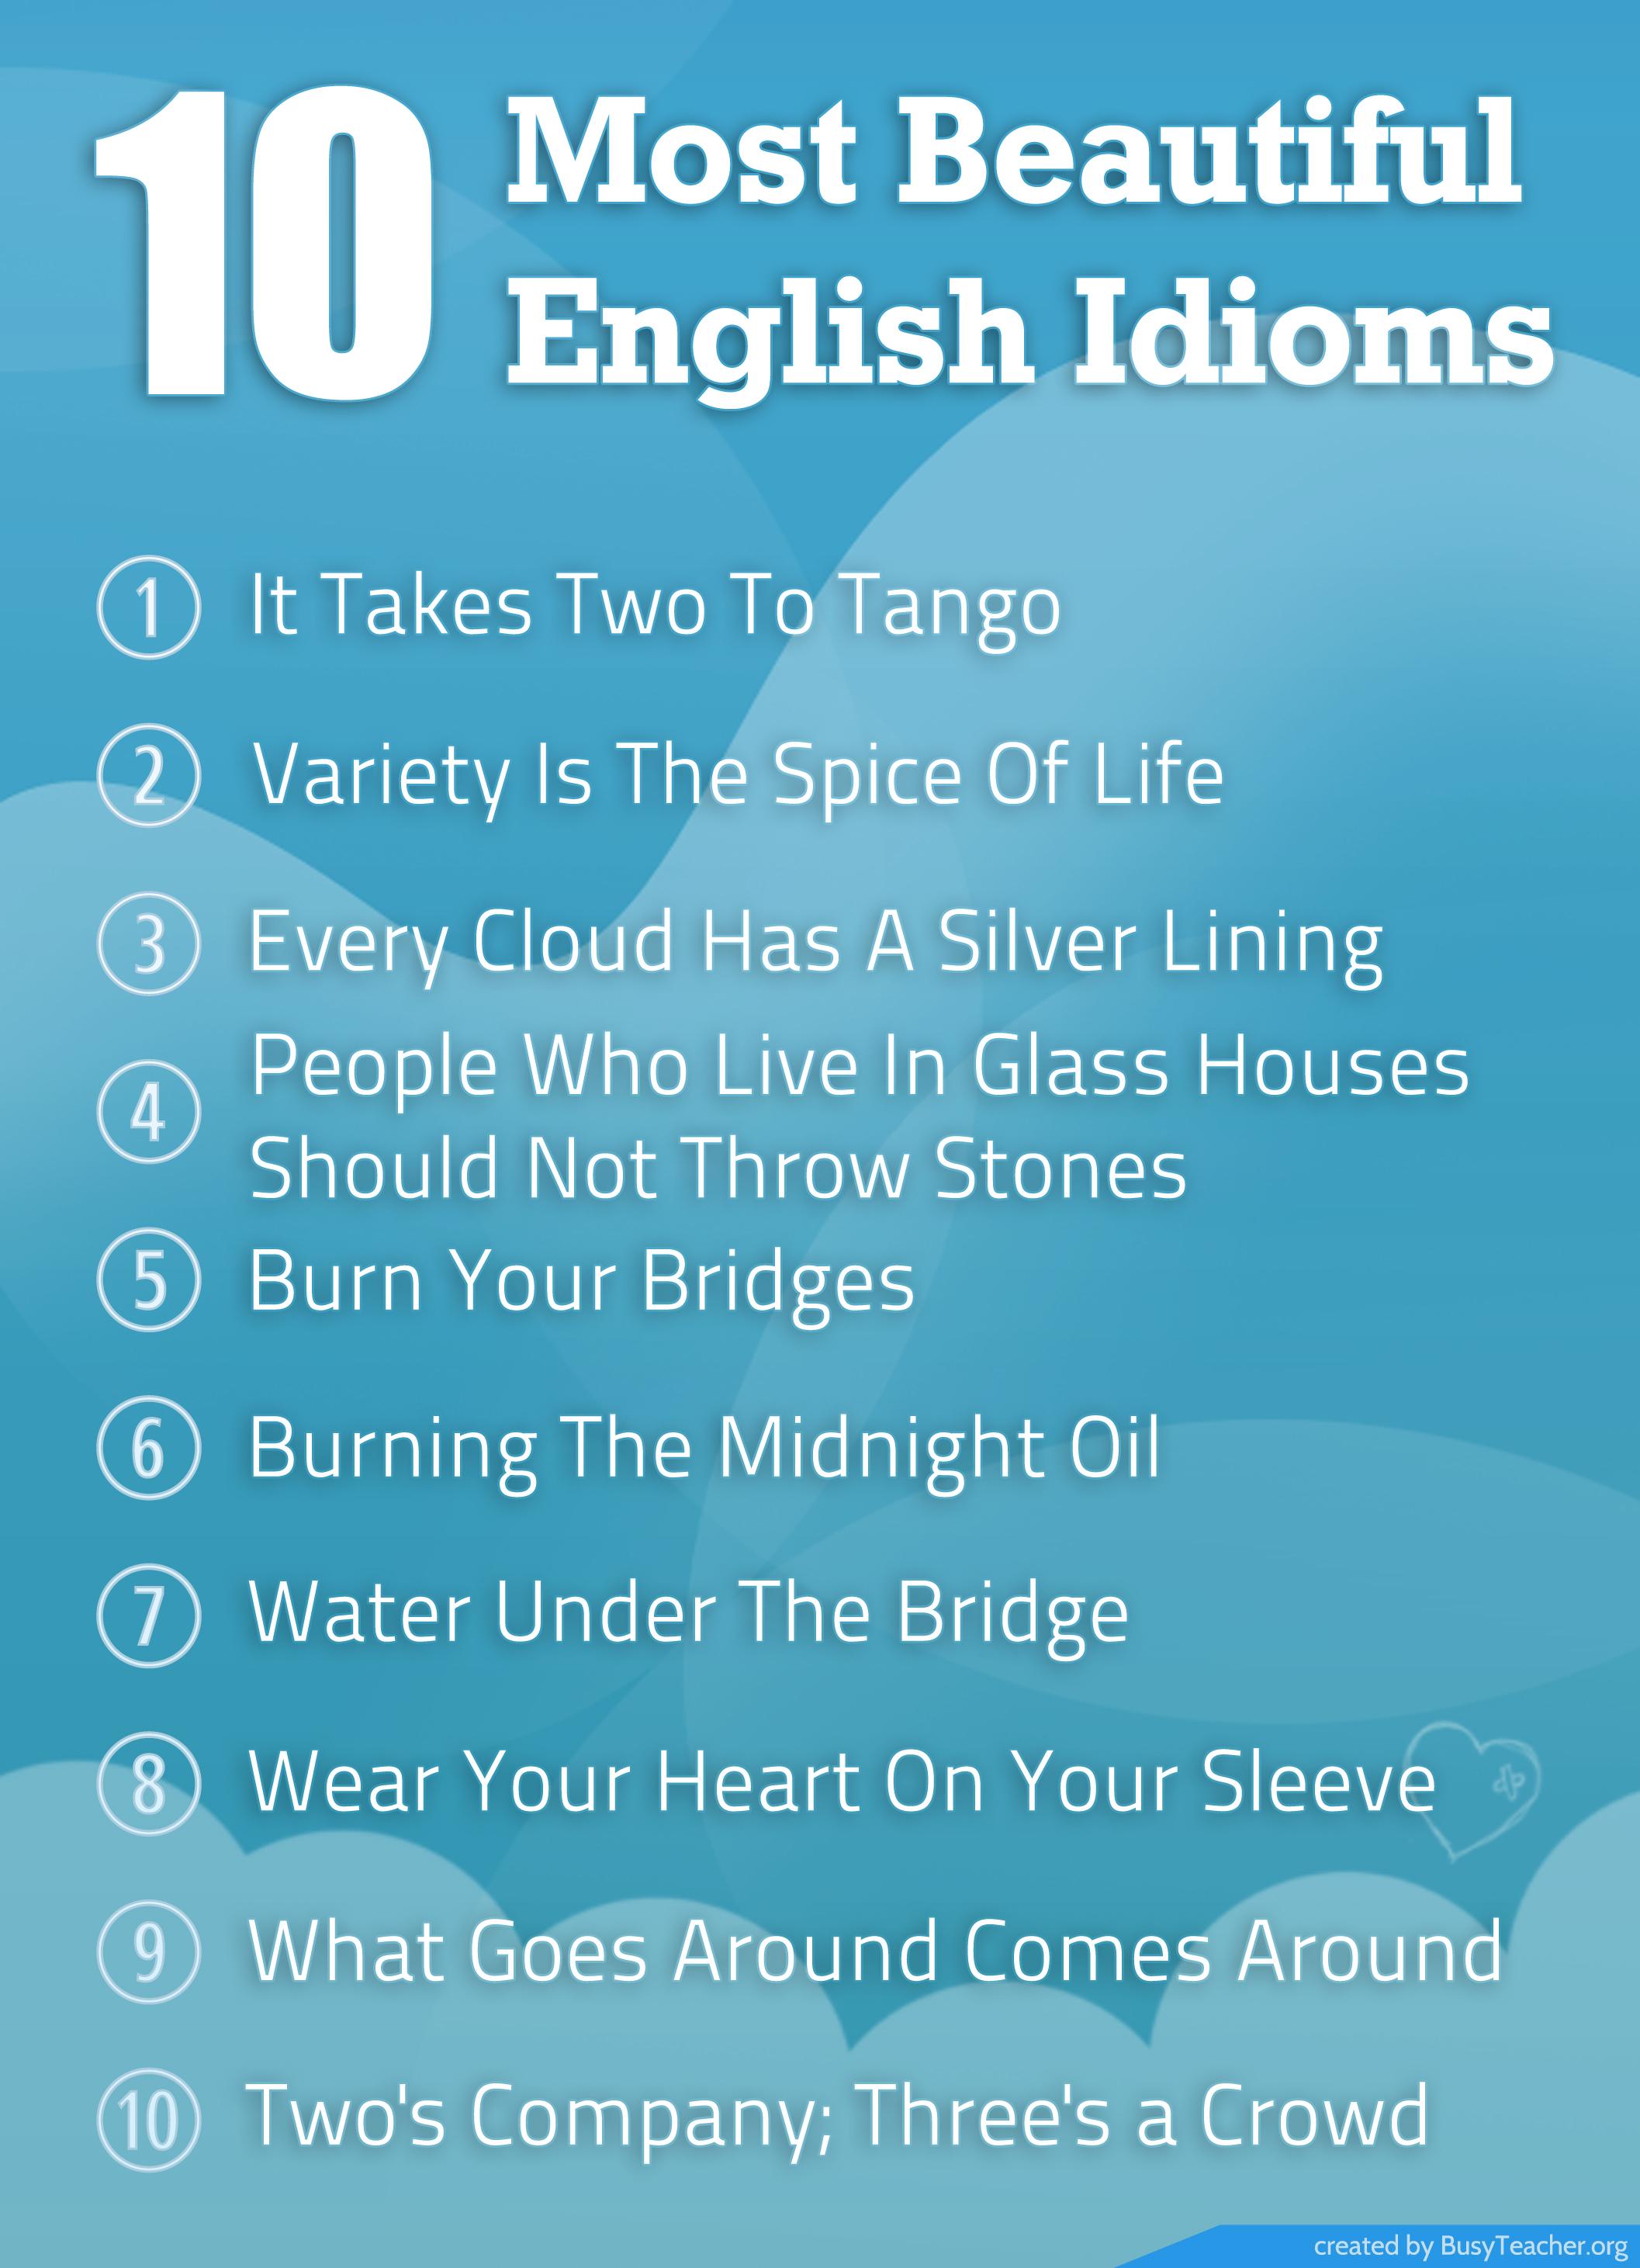 10 Most Beautiful English Idioms Poster